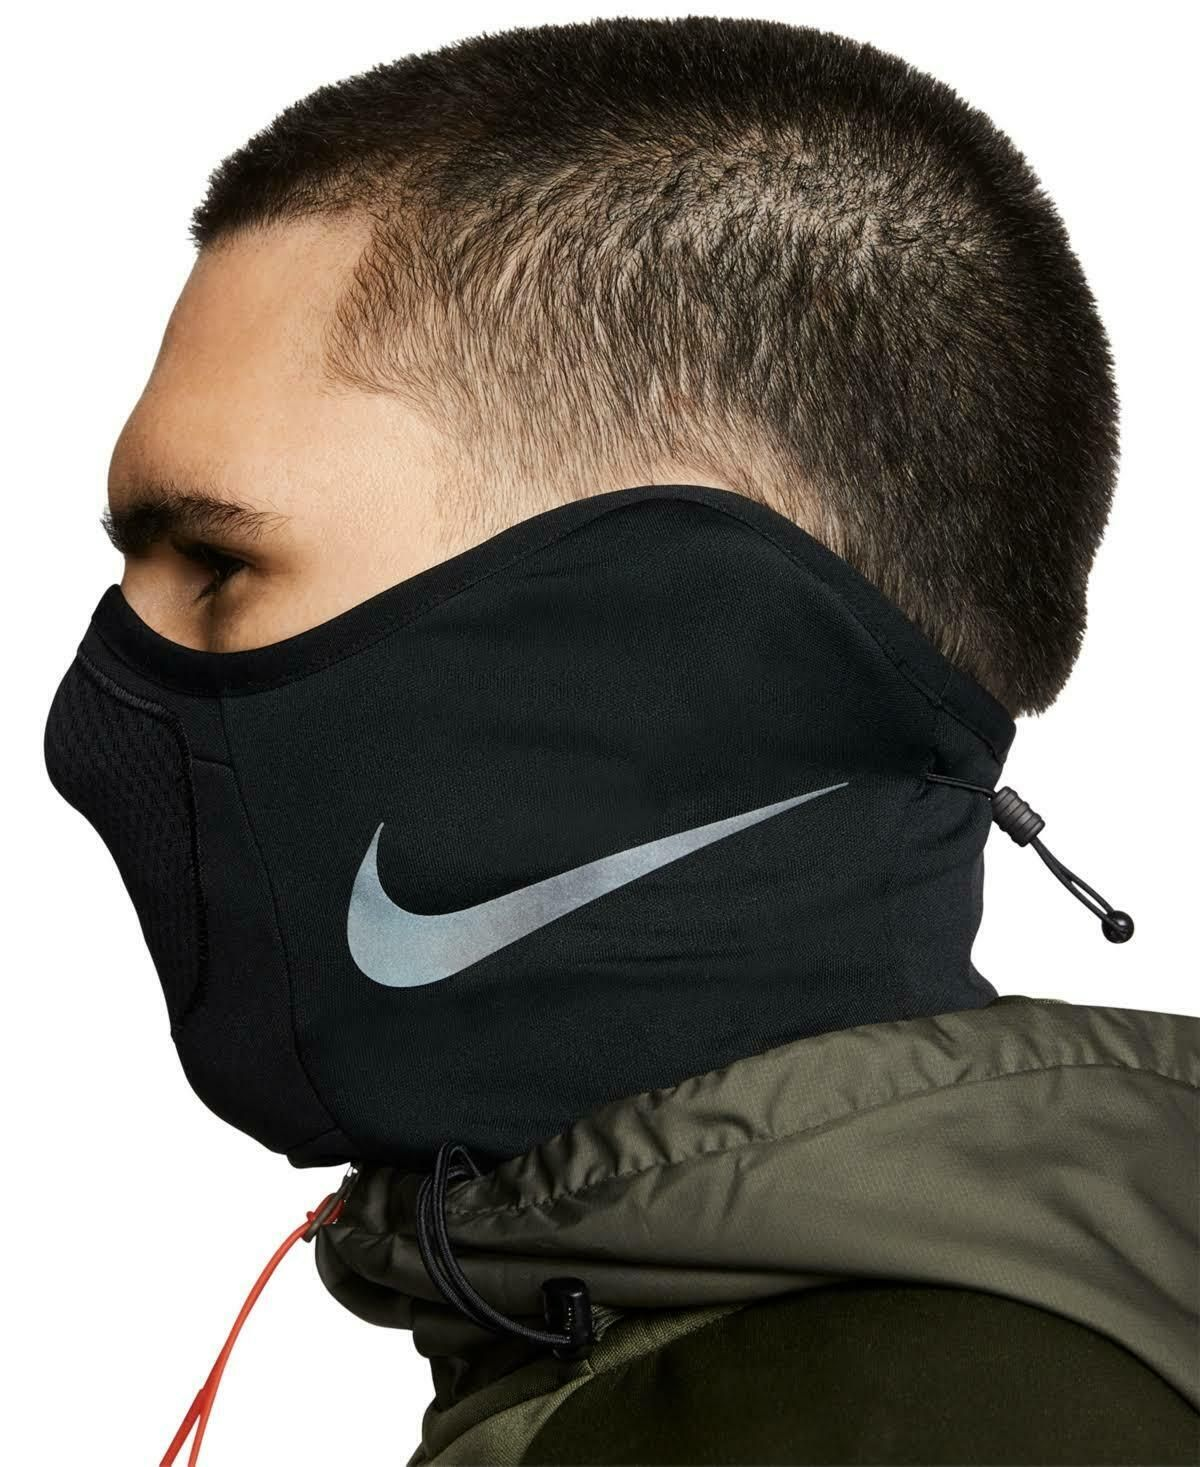 Brand New Nike Dri Fit Soccer Strike Snood Face Scarf Black White Swoosh Ebay In 2021 Mouth Mask Fashion Fashion Face Mask Mask